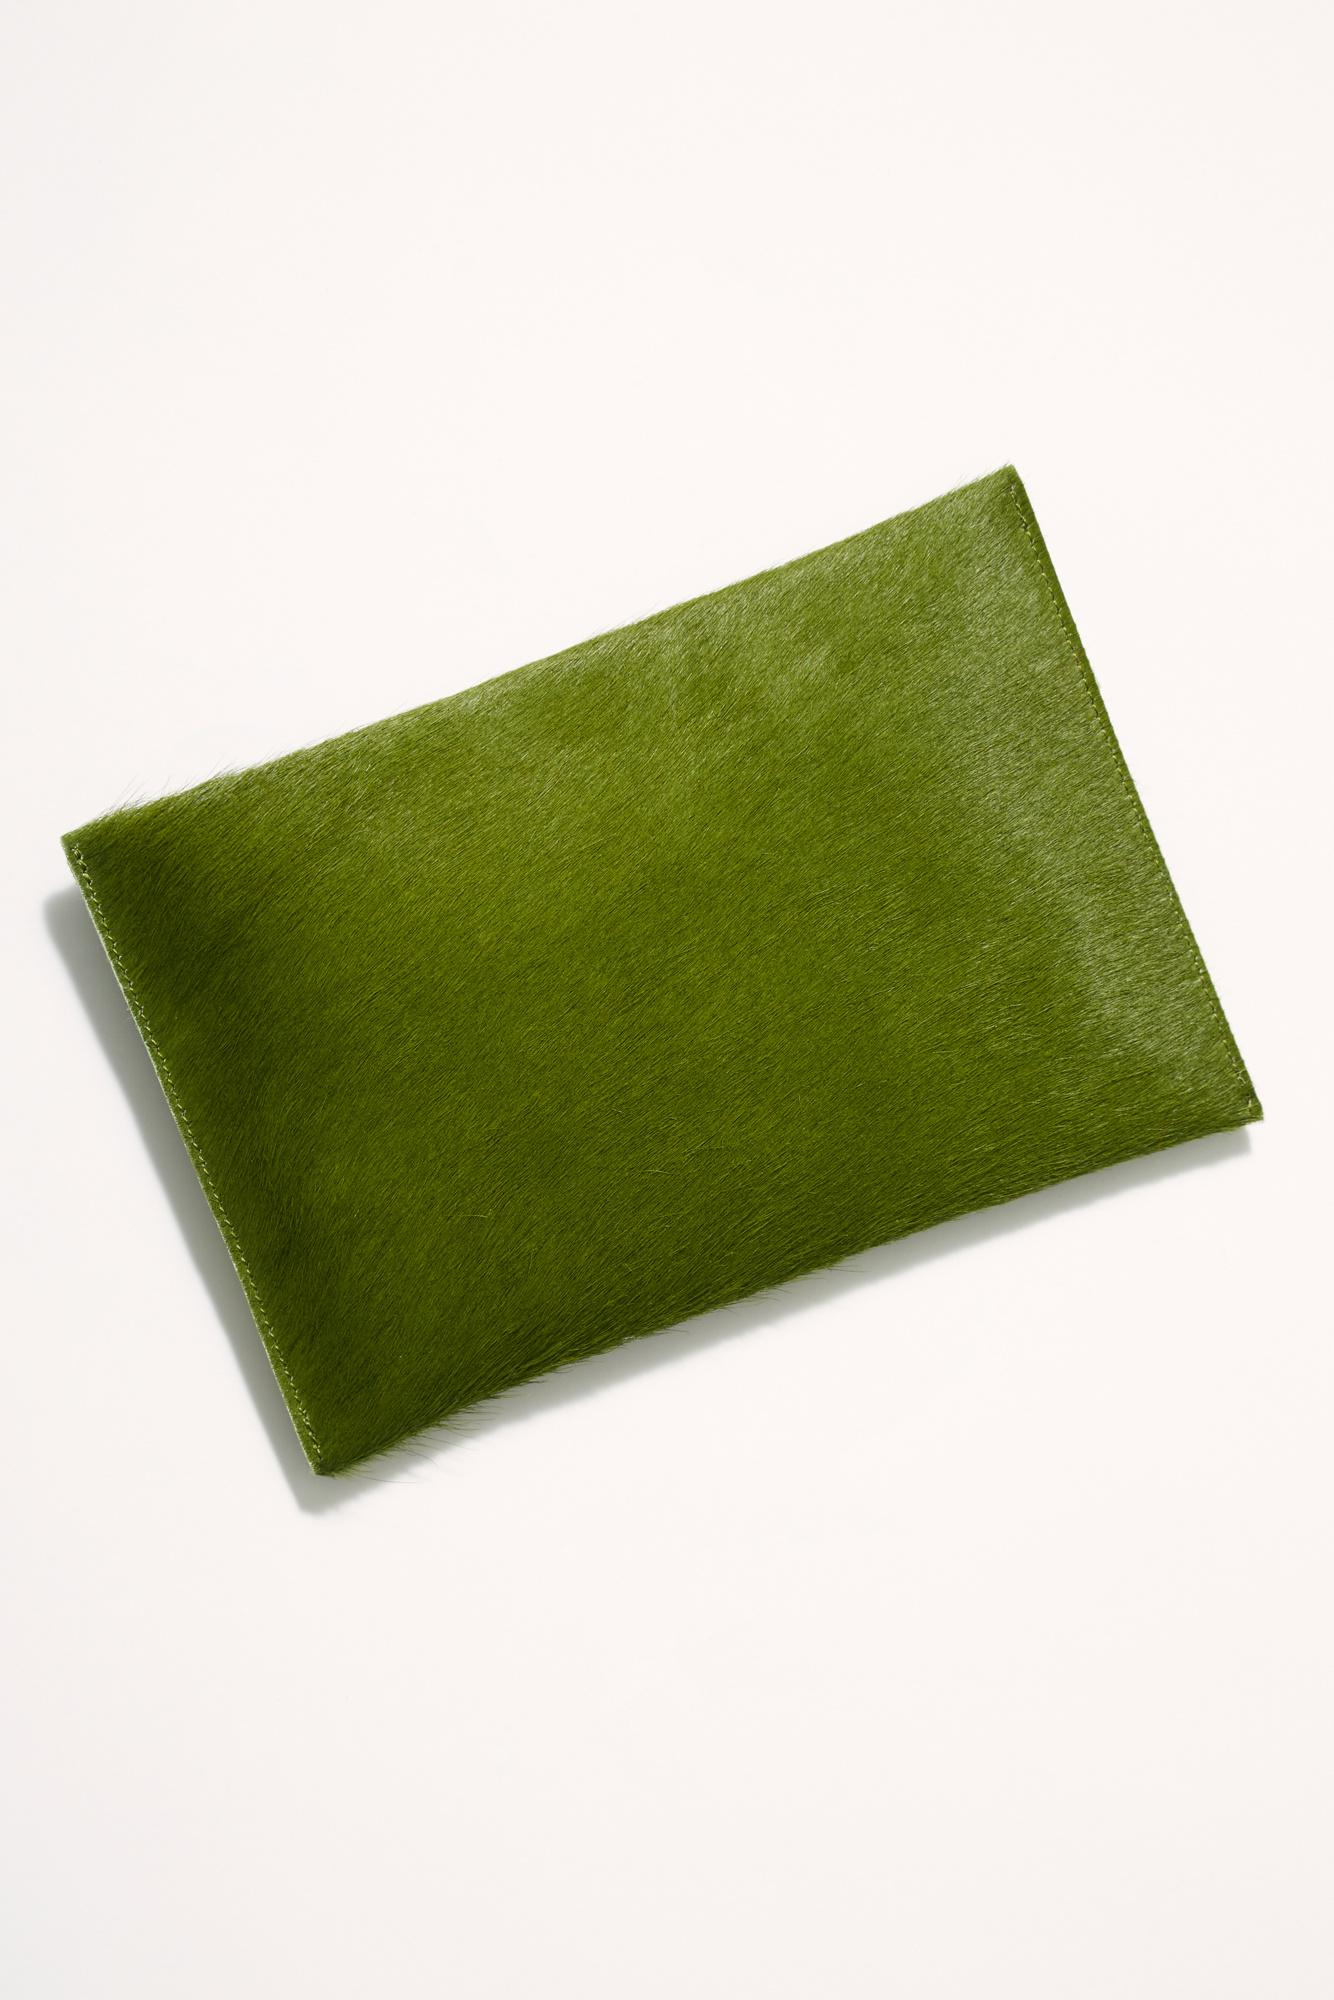 4bda5a74a Free People Primecut Envelope Clutch in Green - Lyst